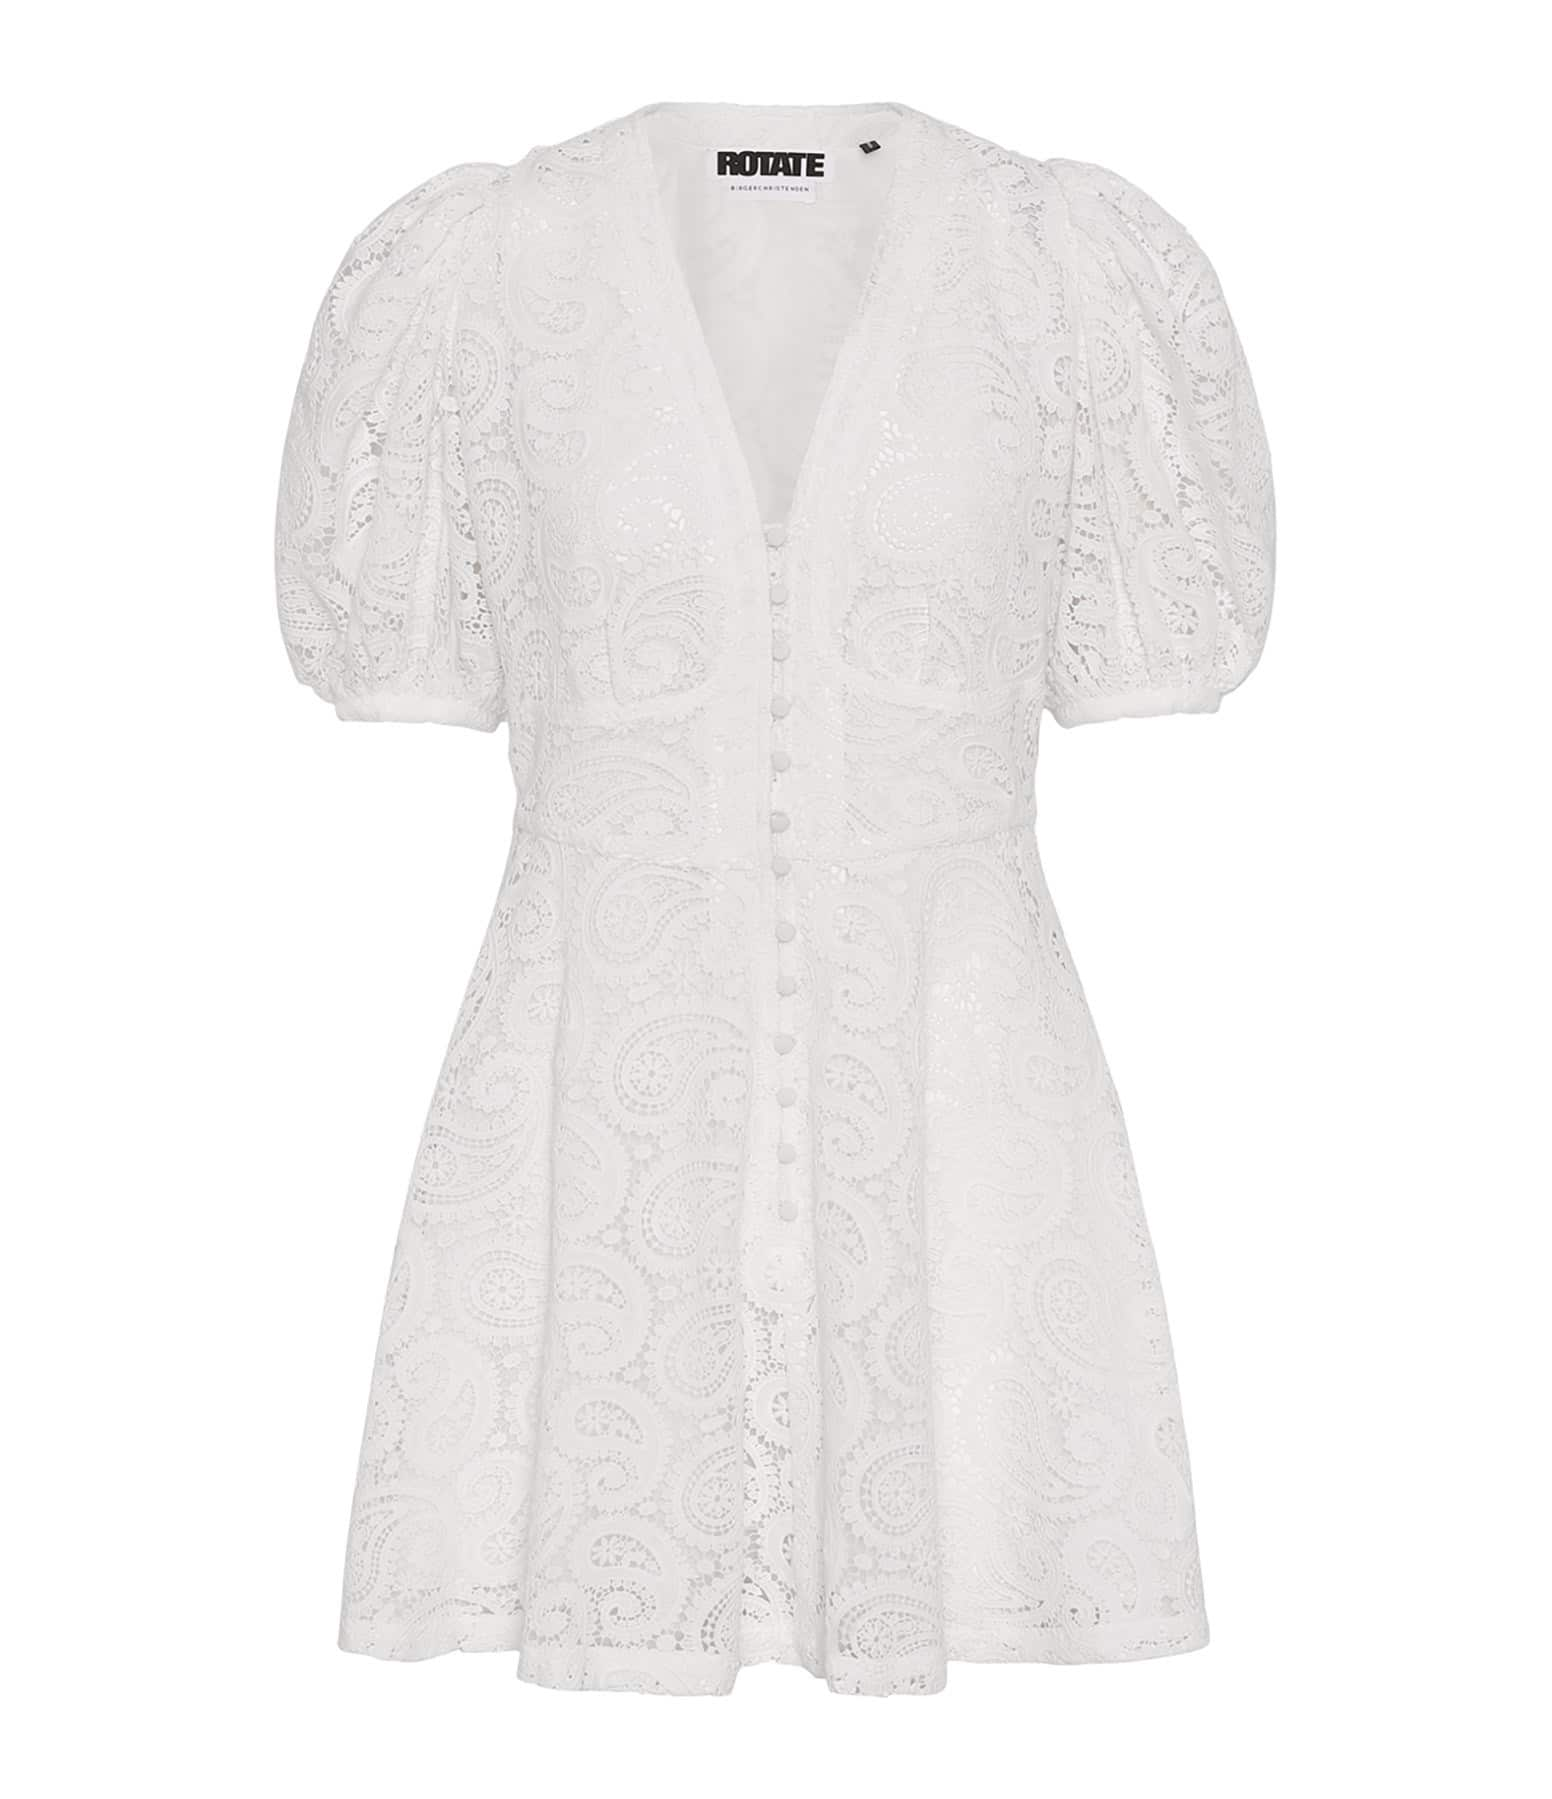 ROTATE - Robe Deanna Coton Biologique Blanc Brillant